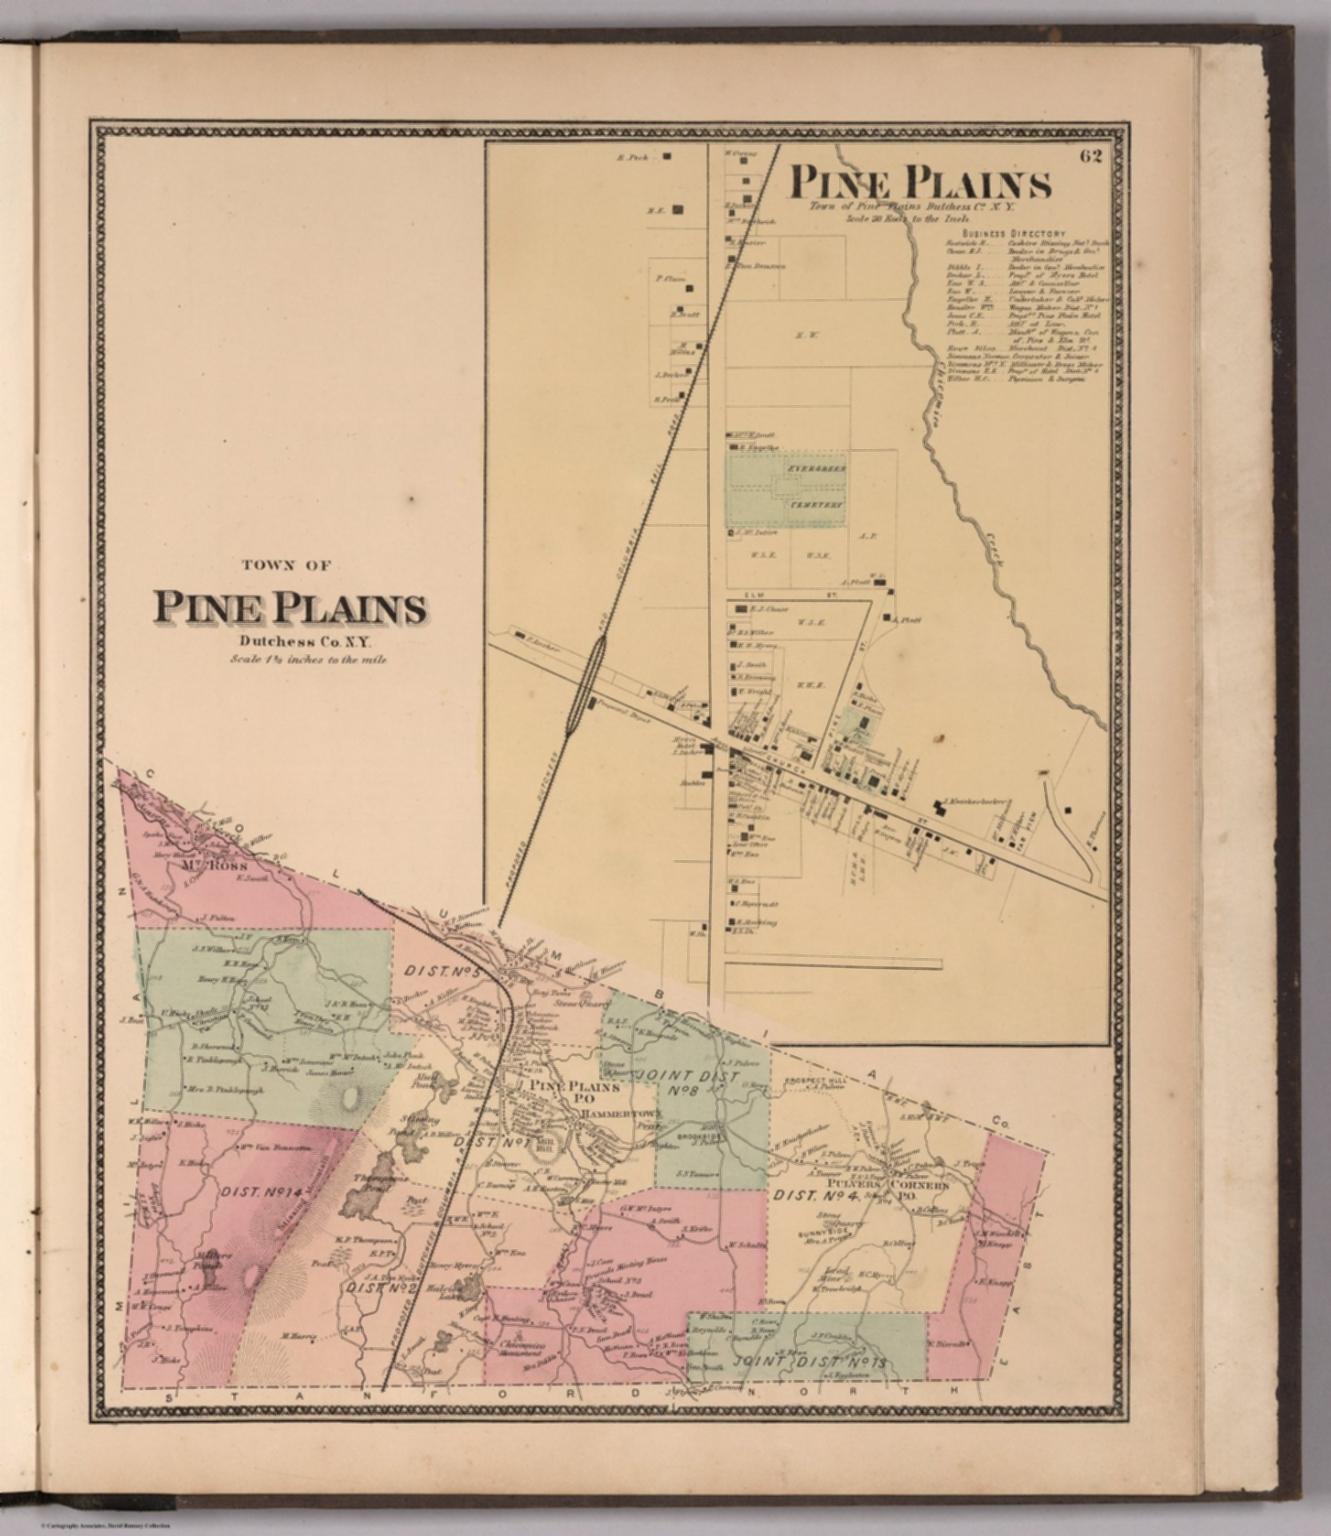 Town of Pine Plains, Dutchess County, New York. (inset) Pine Plains ...